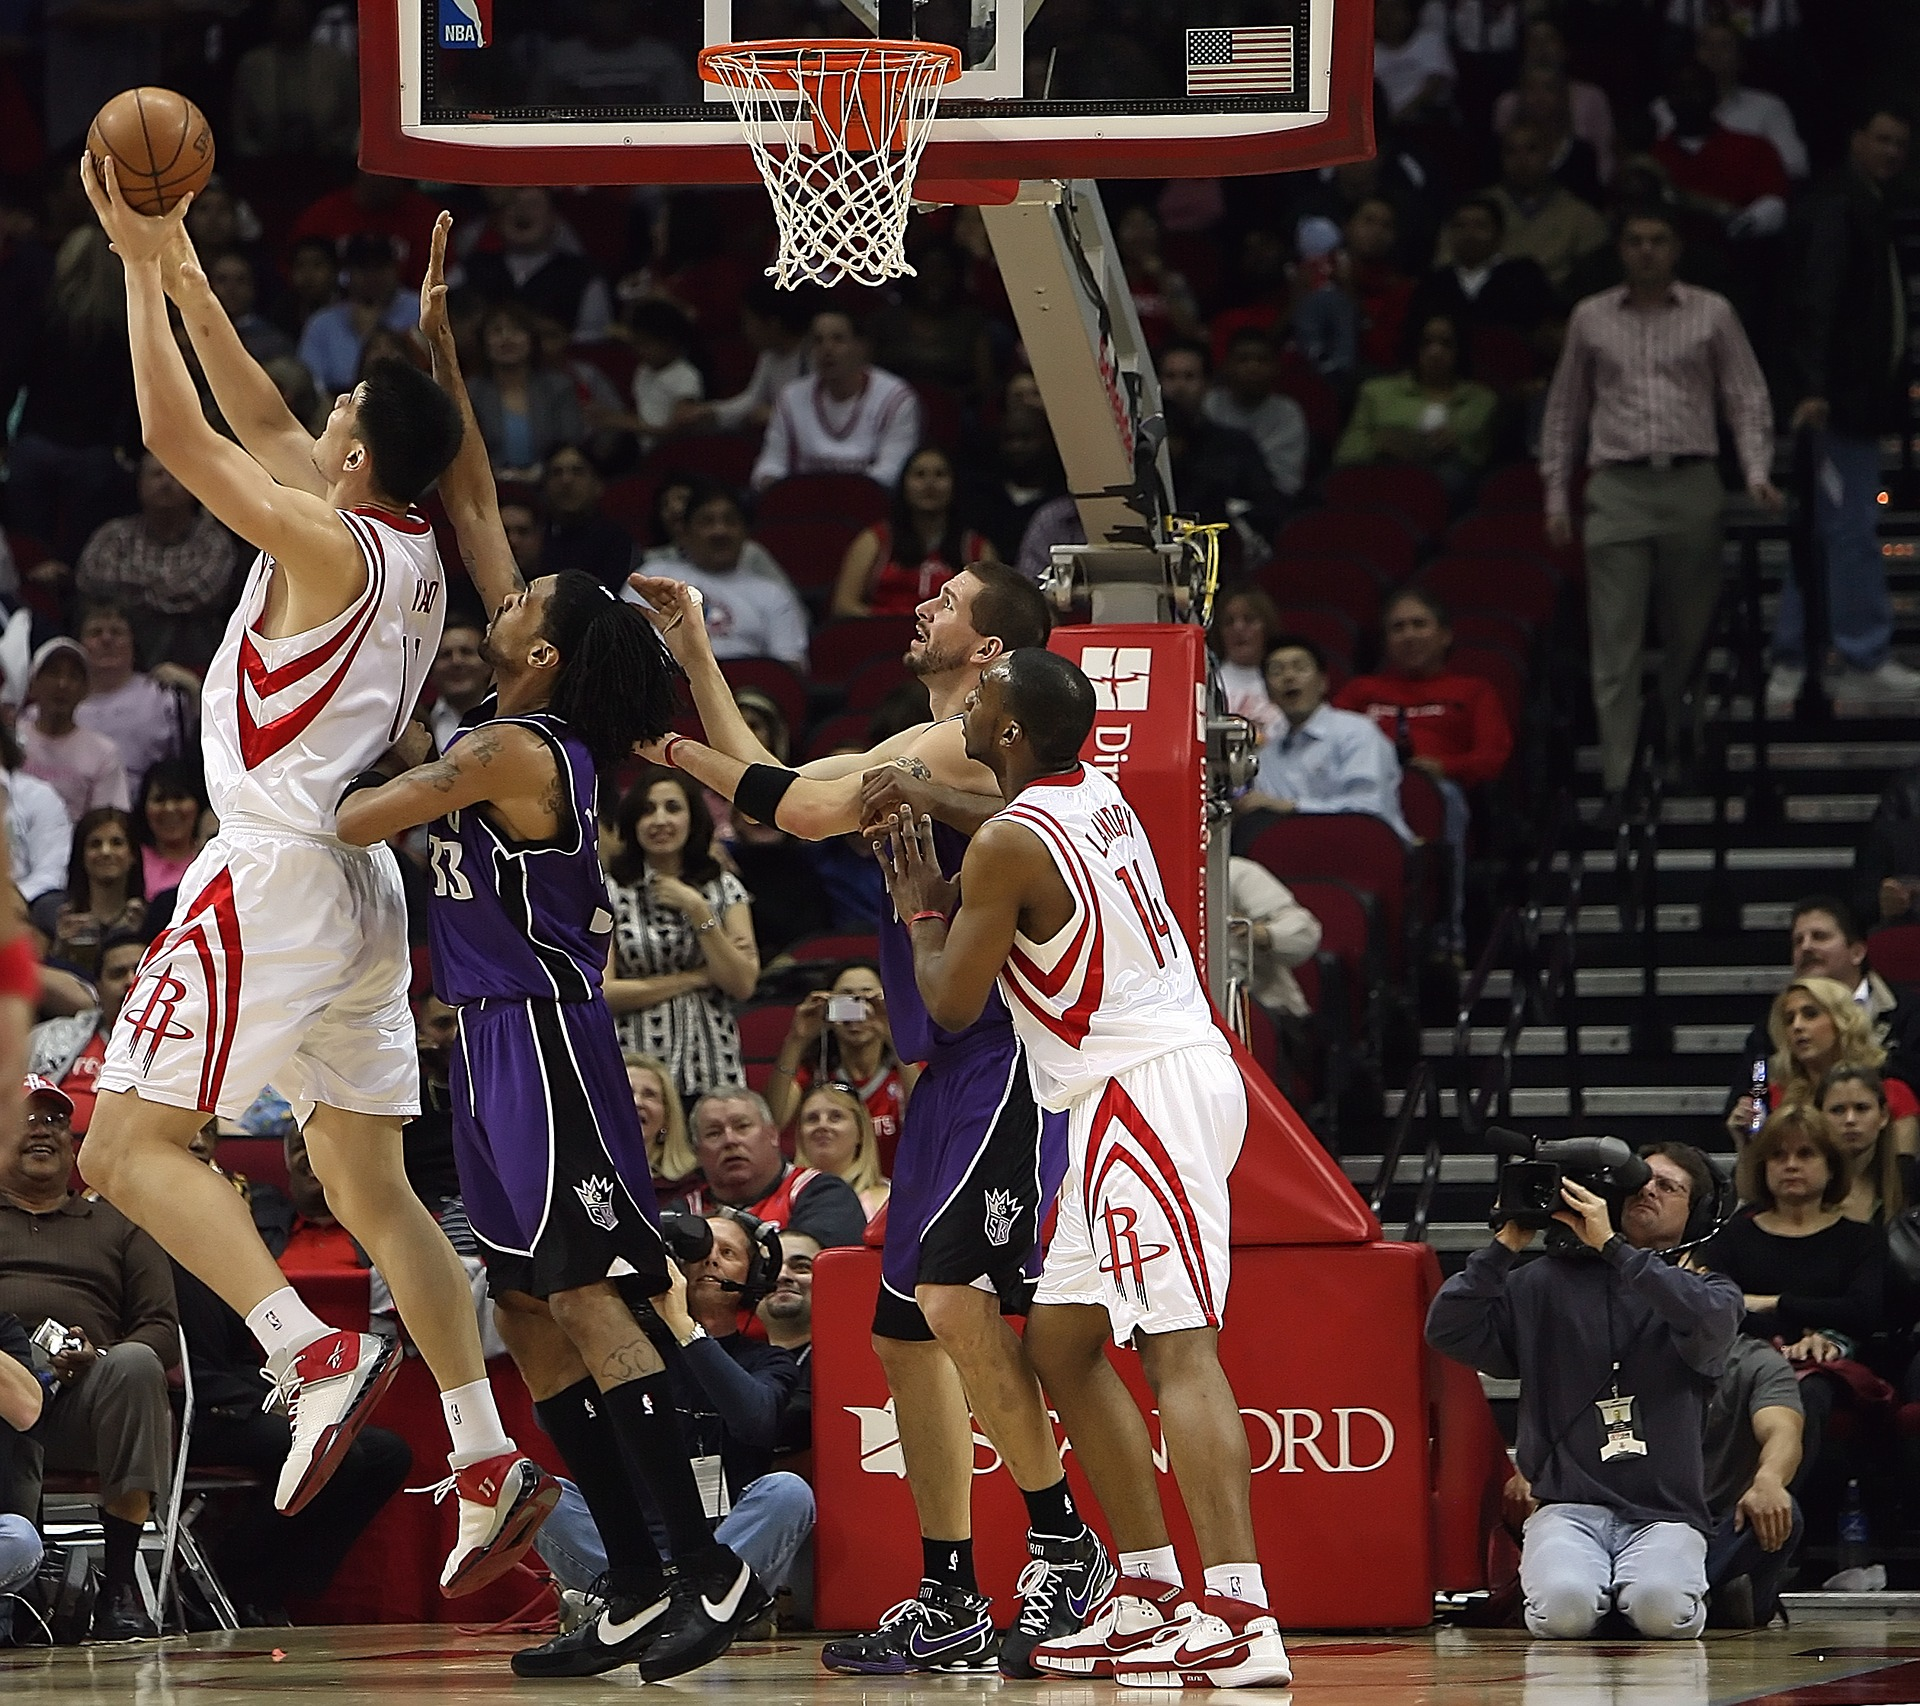 basketball-1544370_1920.jpg